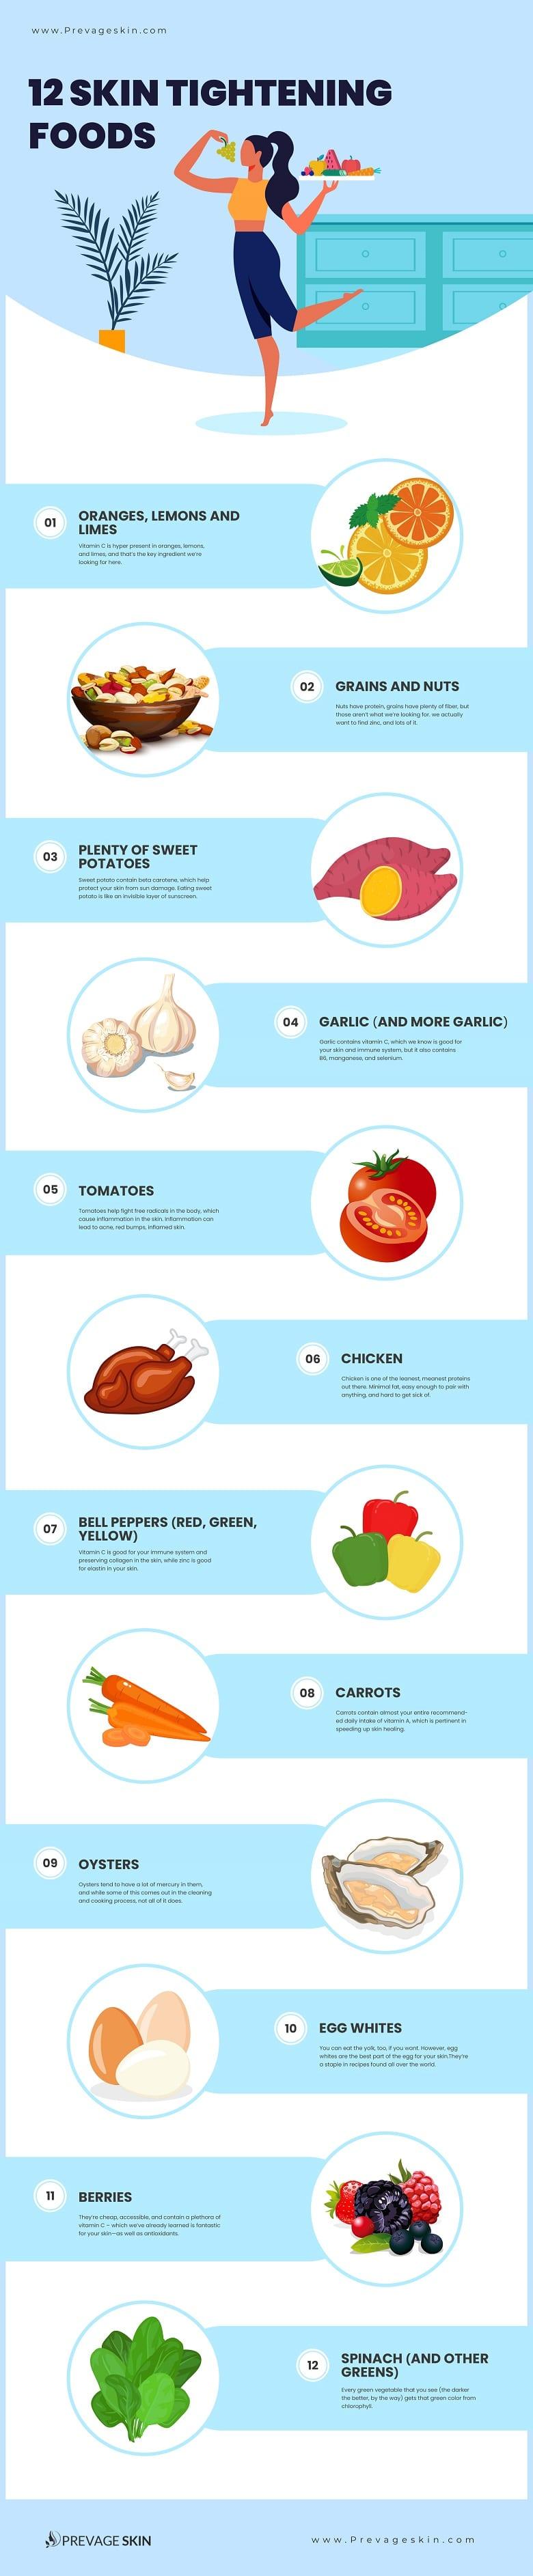 skin tightening foods